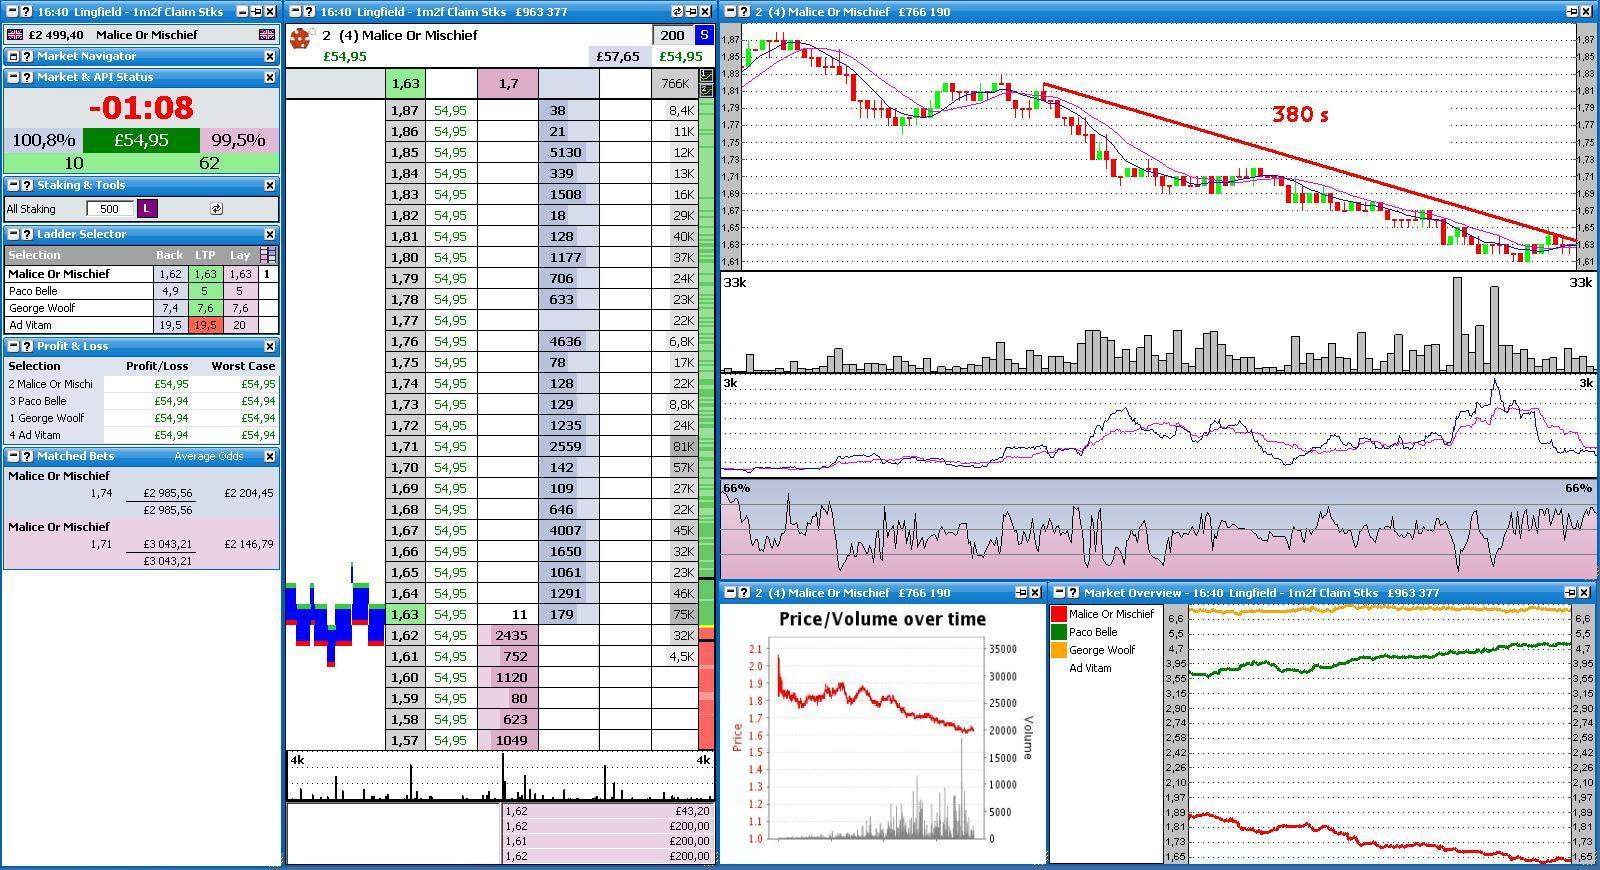 Betfair Spreadsheet Free With Trading Betfair